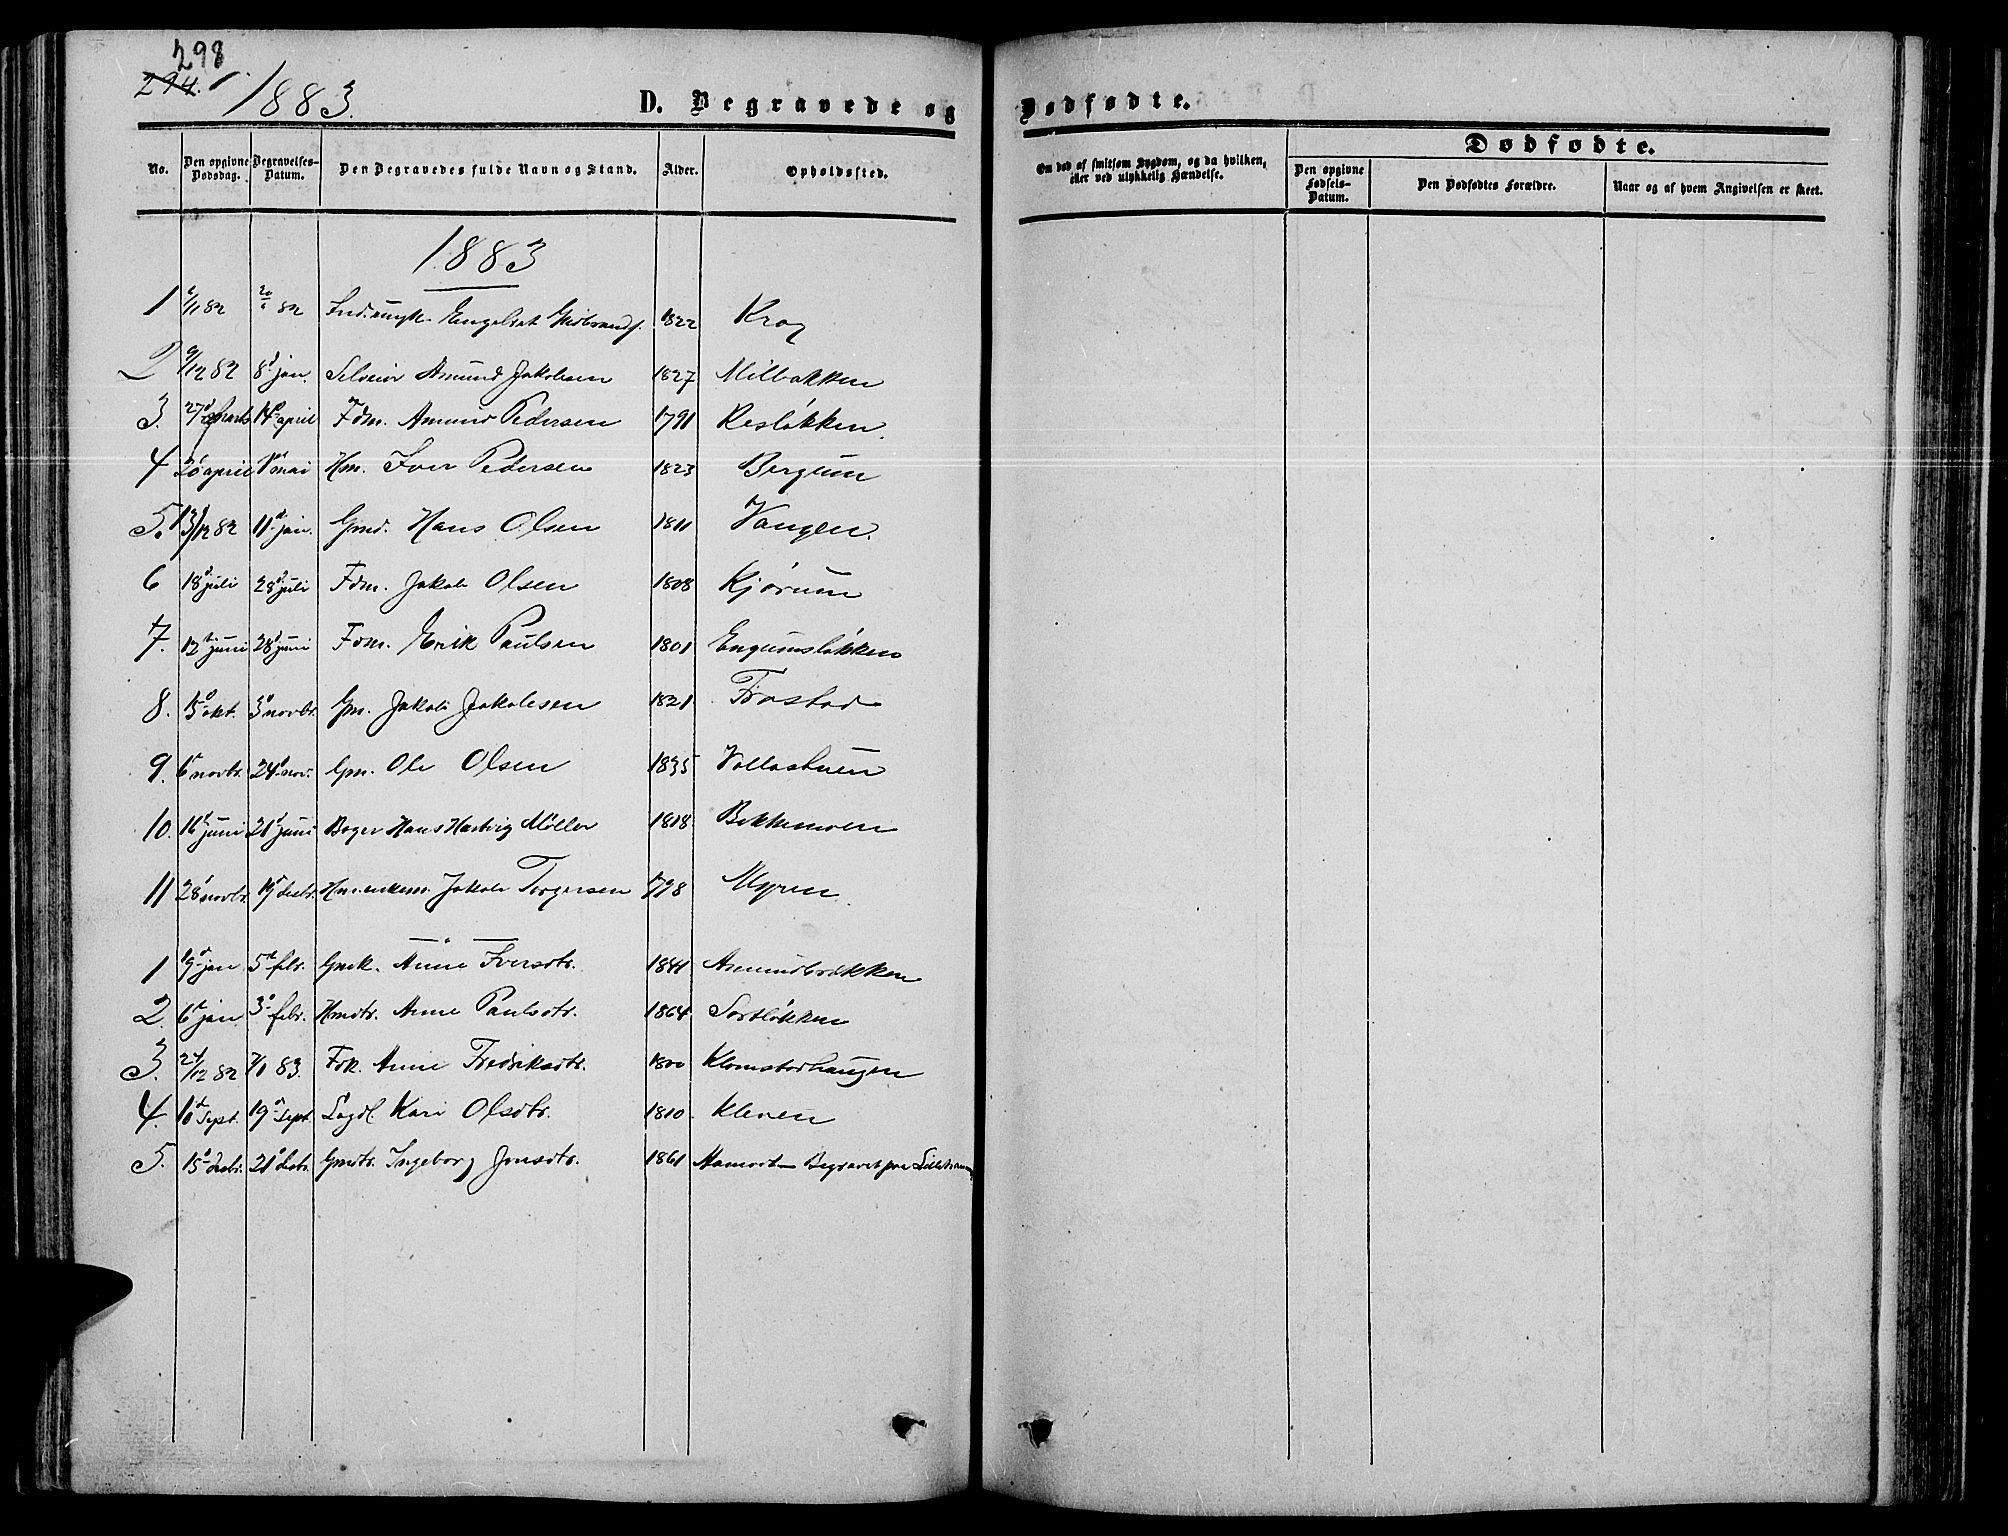 SAH, Nord-Fron prestekontor, Klokkerbok nr. 3, 1851-1886, s. 298